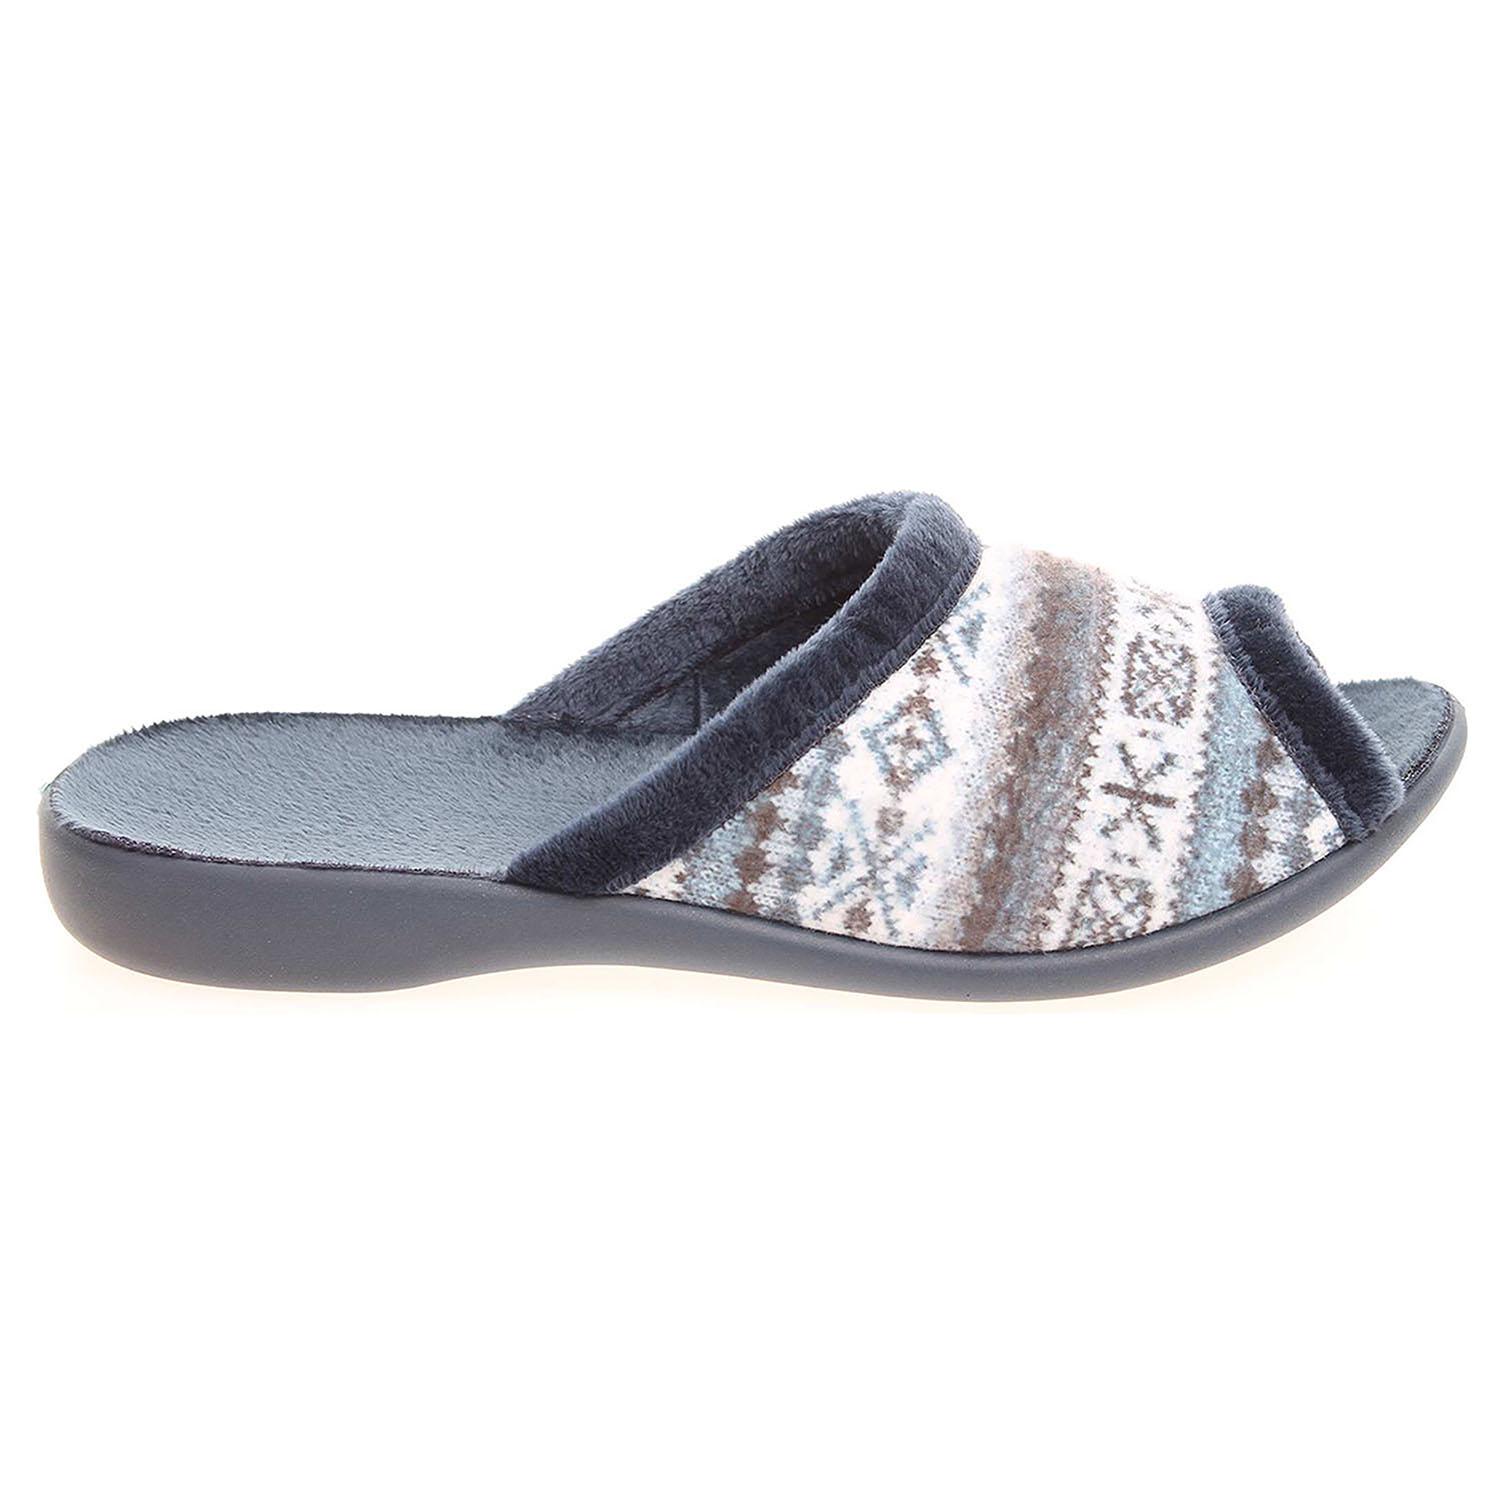 Ecco Befado domácí pantofle 254D036 modré 23500396